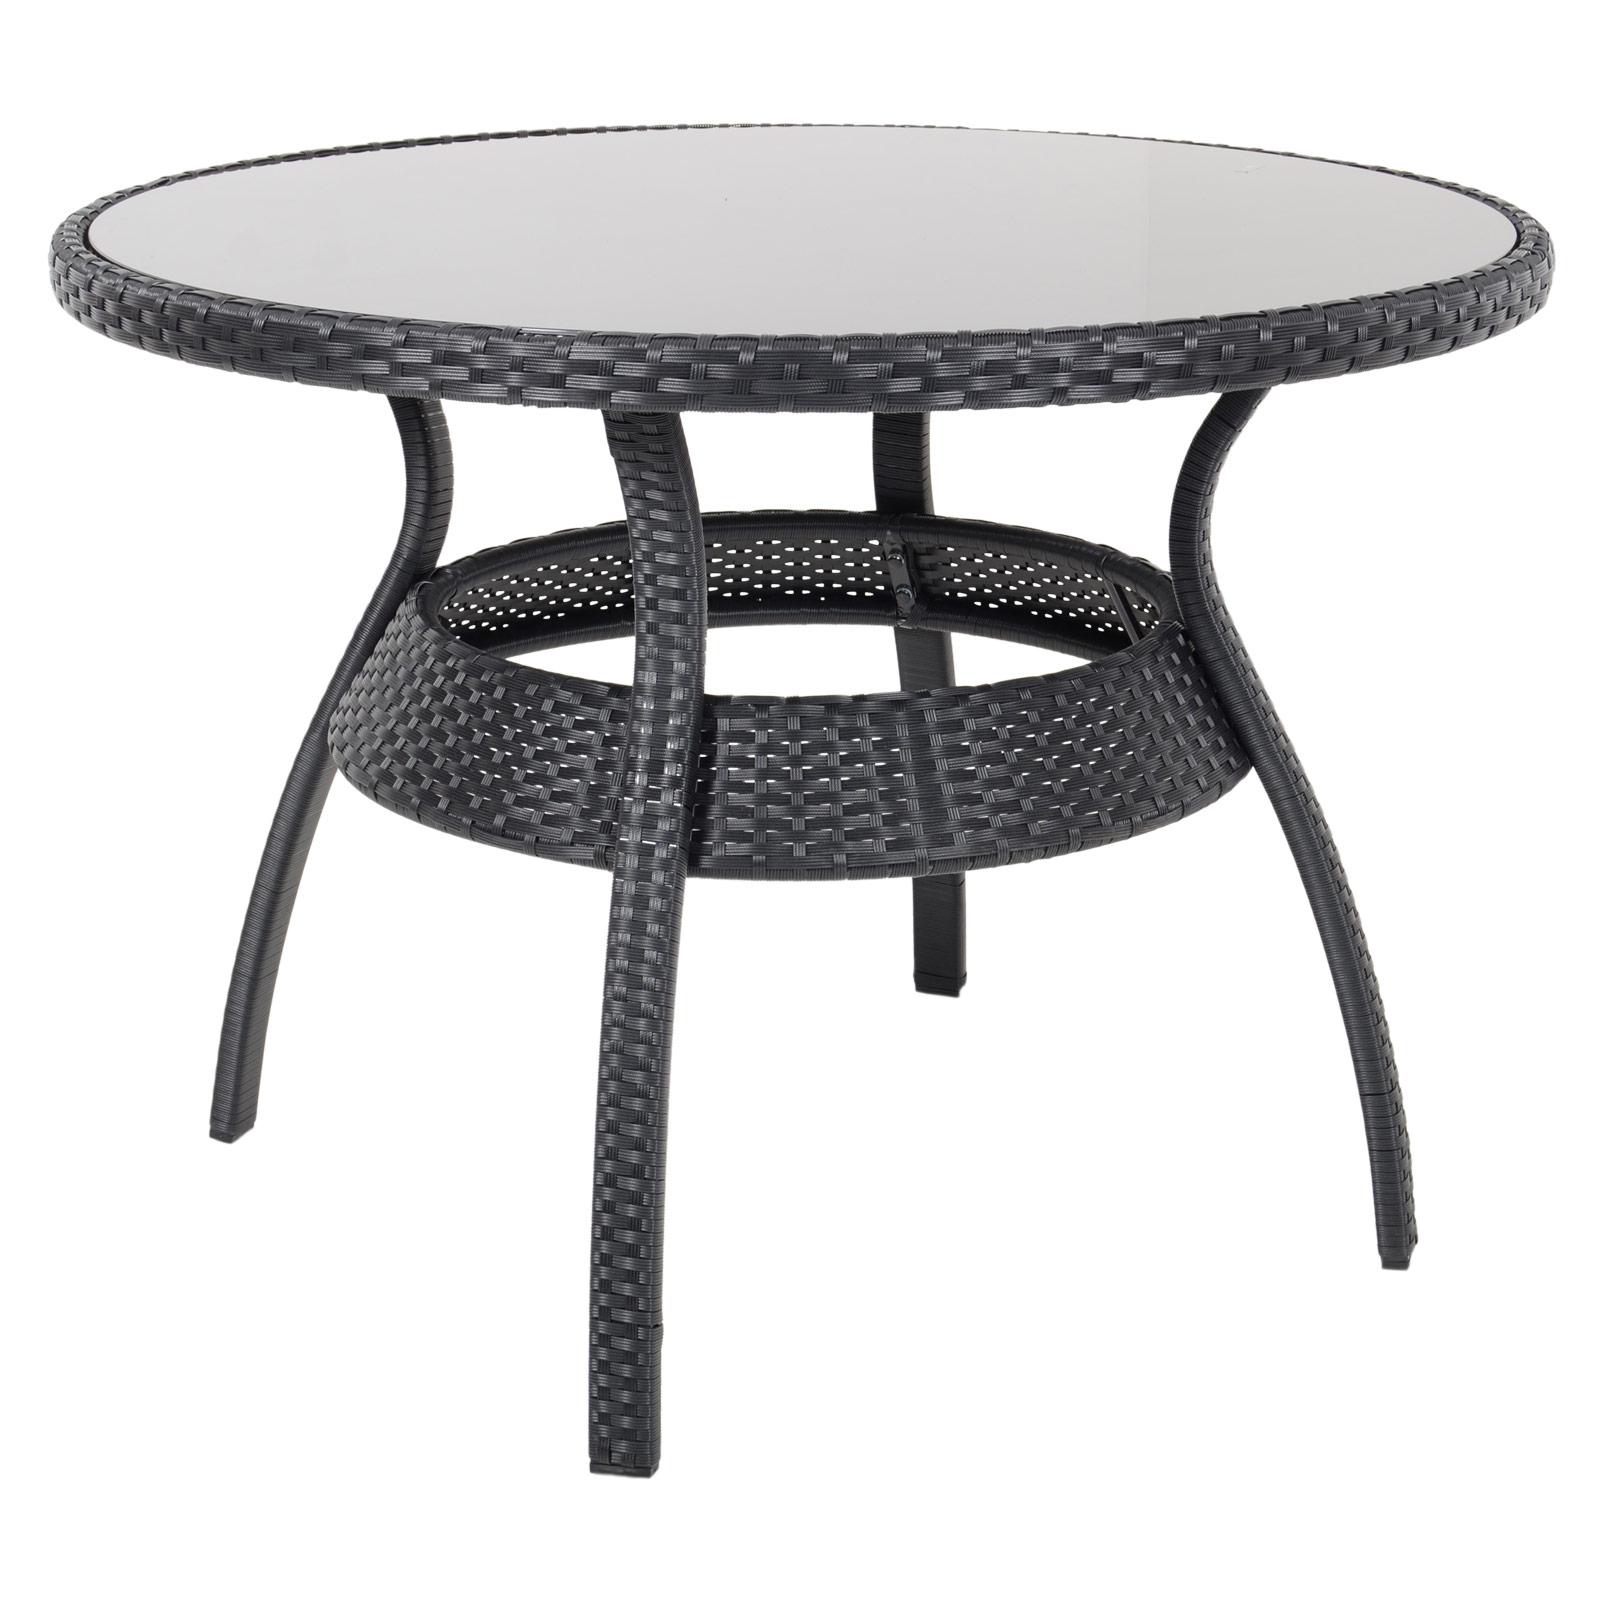 Ravenna Dining Table 4 Chairs Black Rattan Wicker